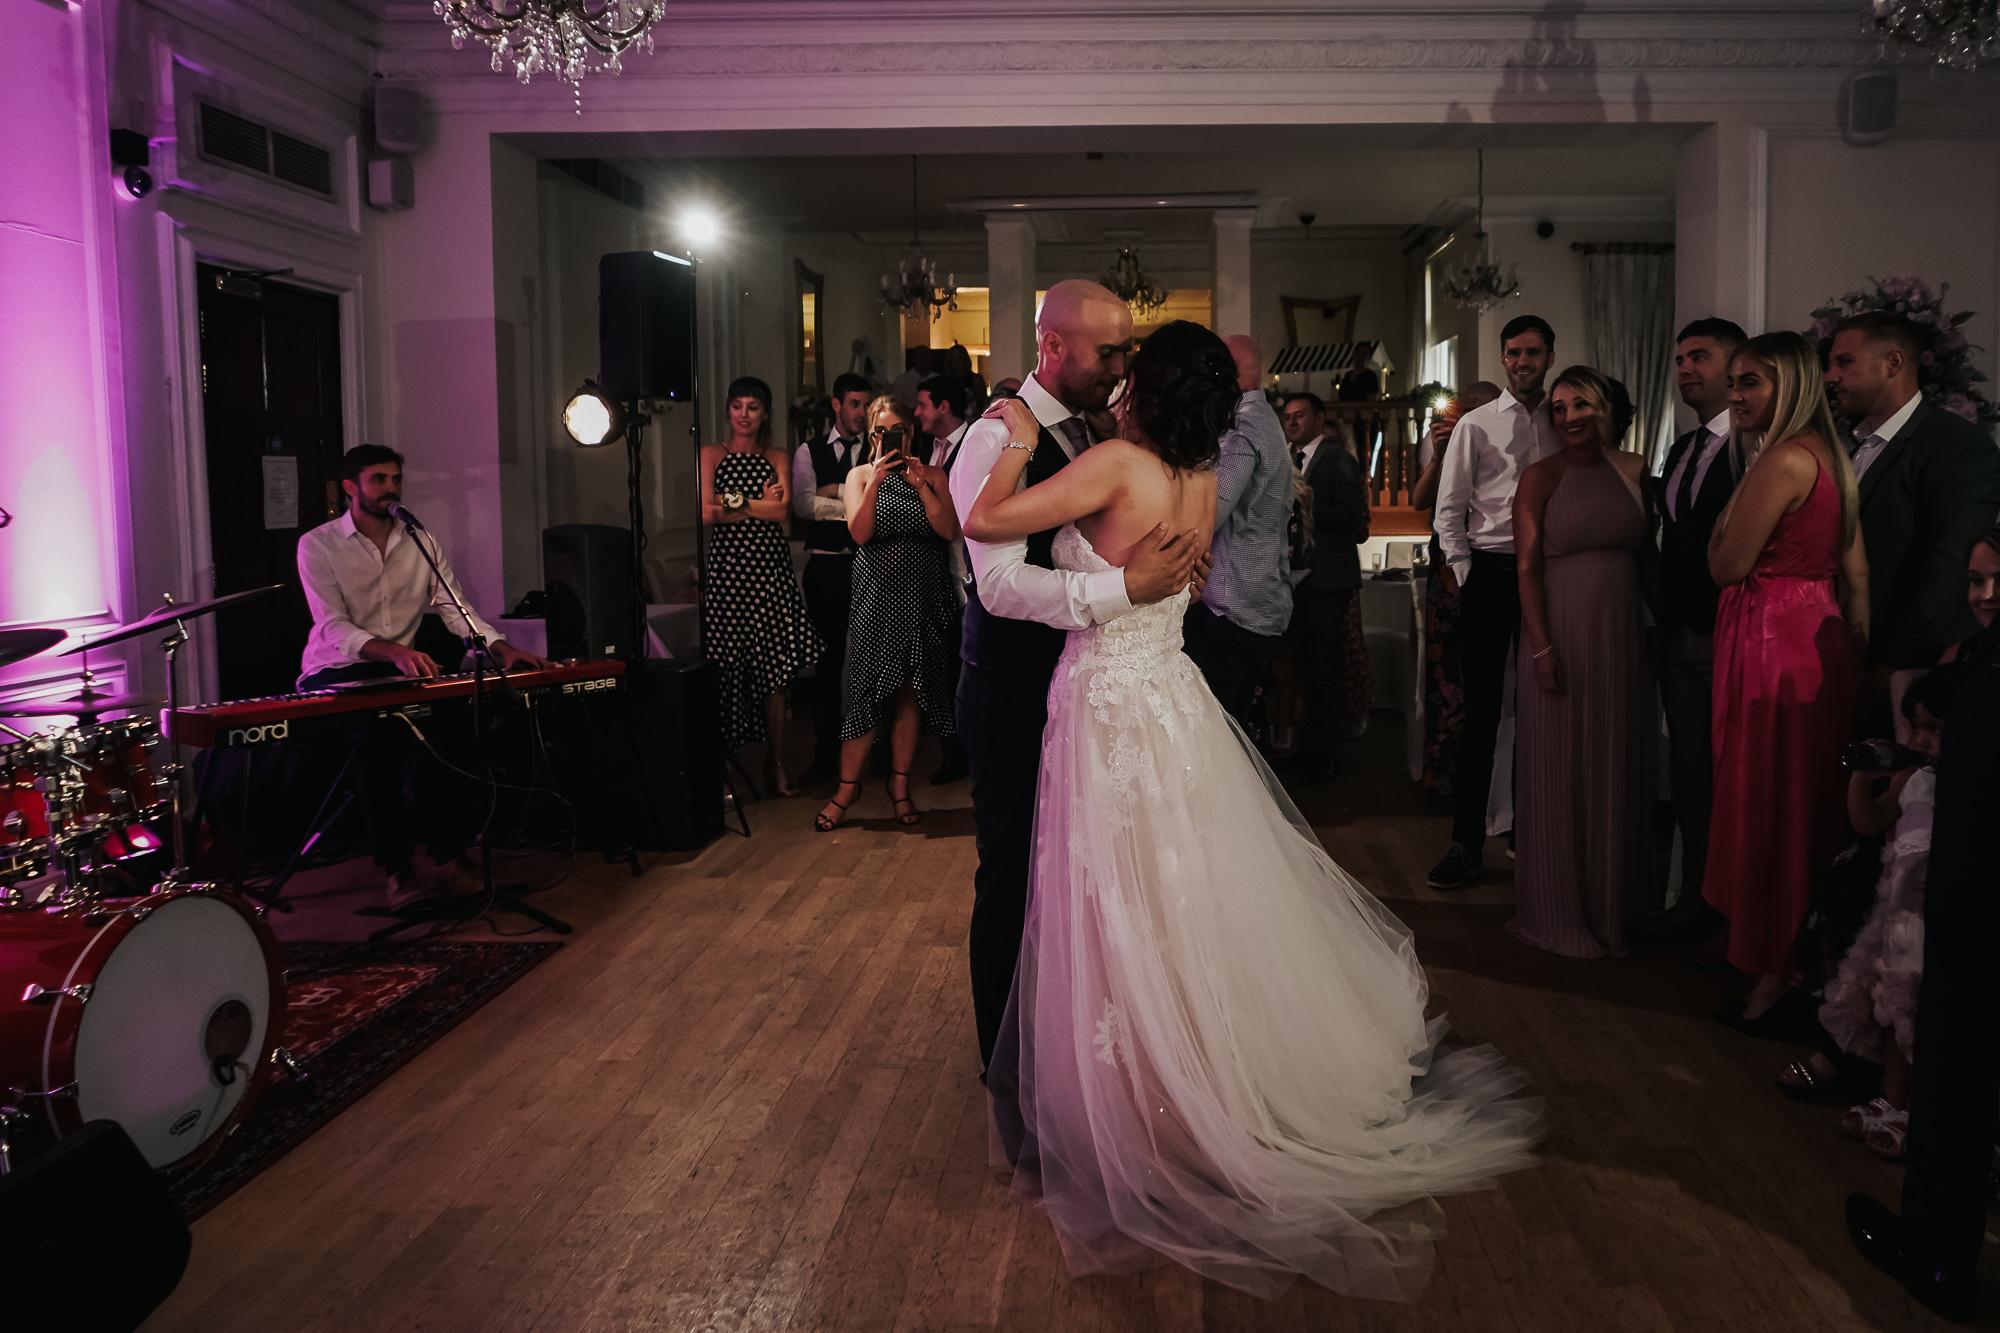 West Tower Wedding Venue Orkskirk Lancashire Wedding Photography cheshire wedding photographer (45 of 47).jpg